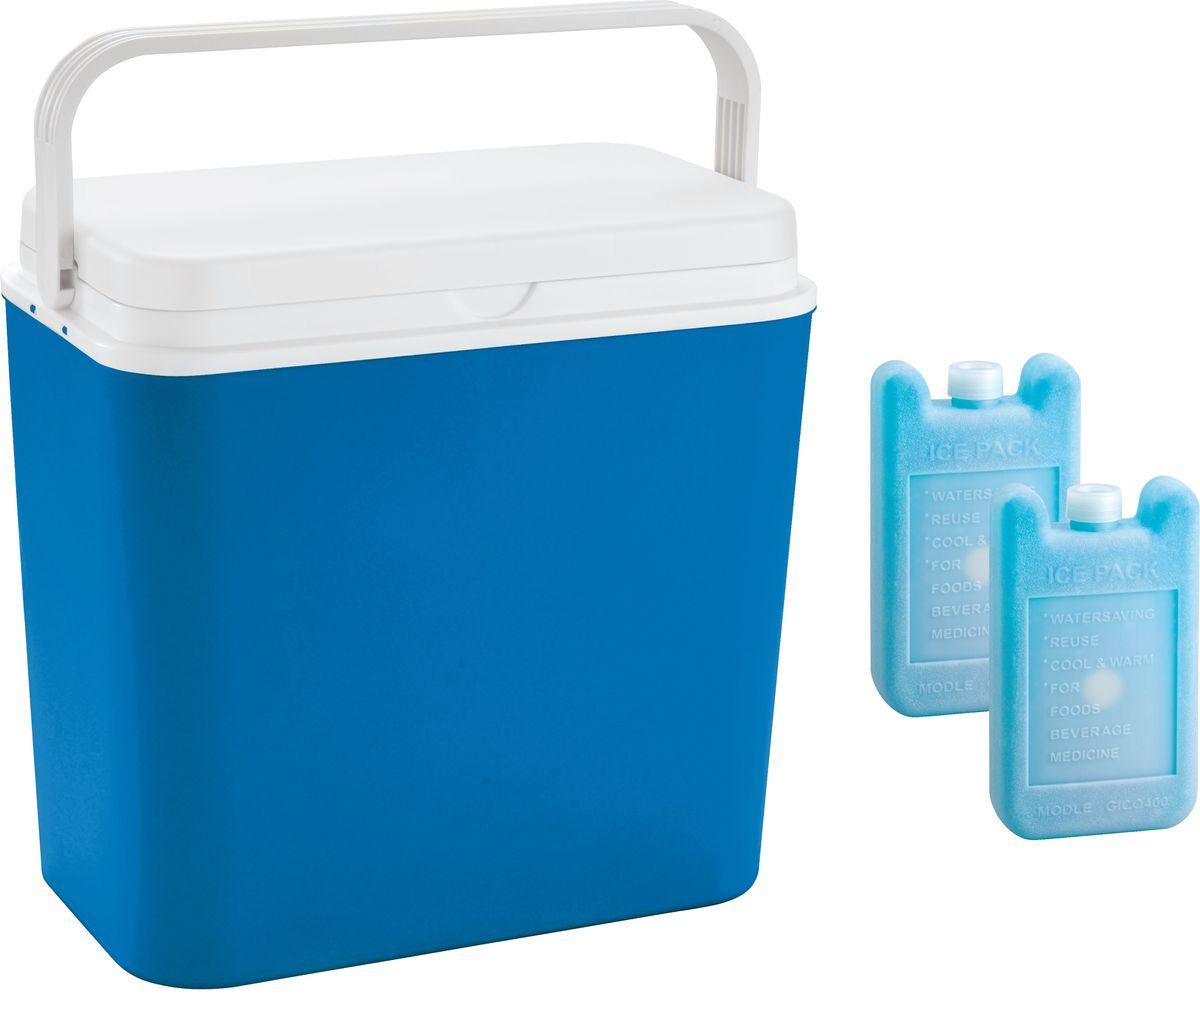 "Контейнер изотермический Atlantic ""Cool Box"", цвет: синий, 24 л + аккумулятор холода, 2 х 400 г"